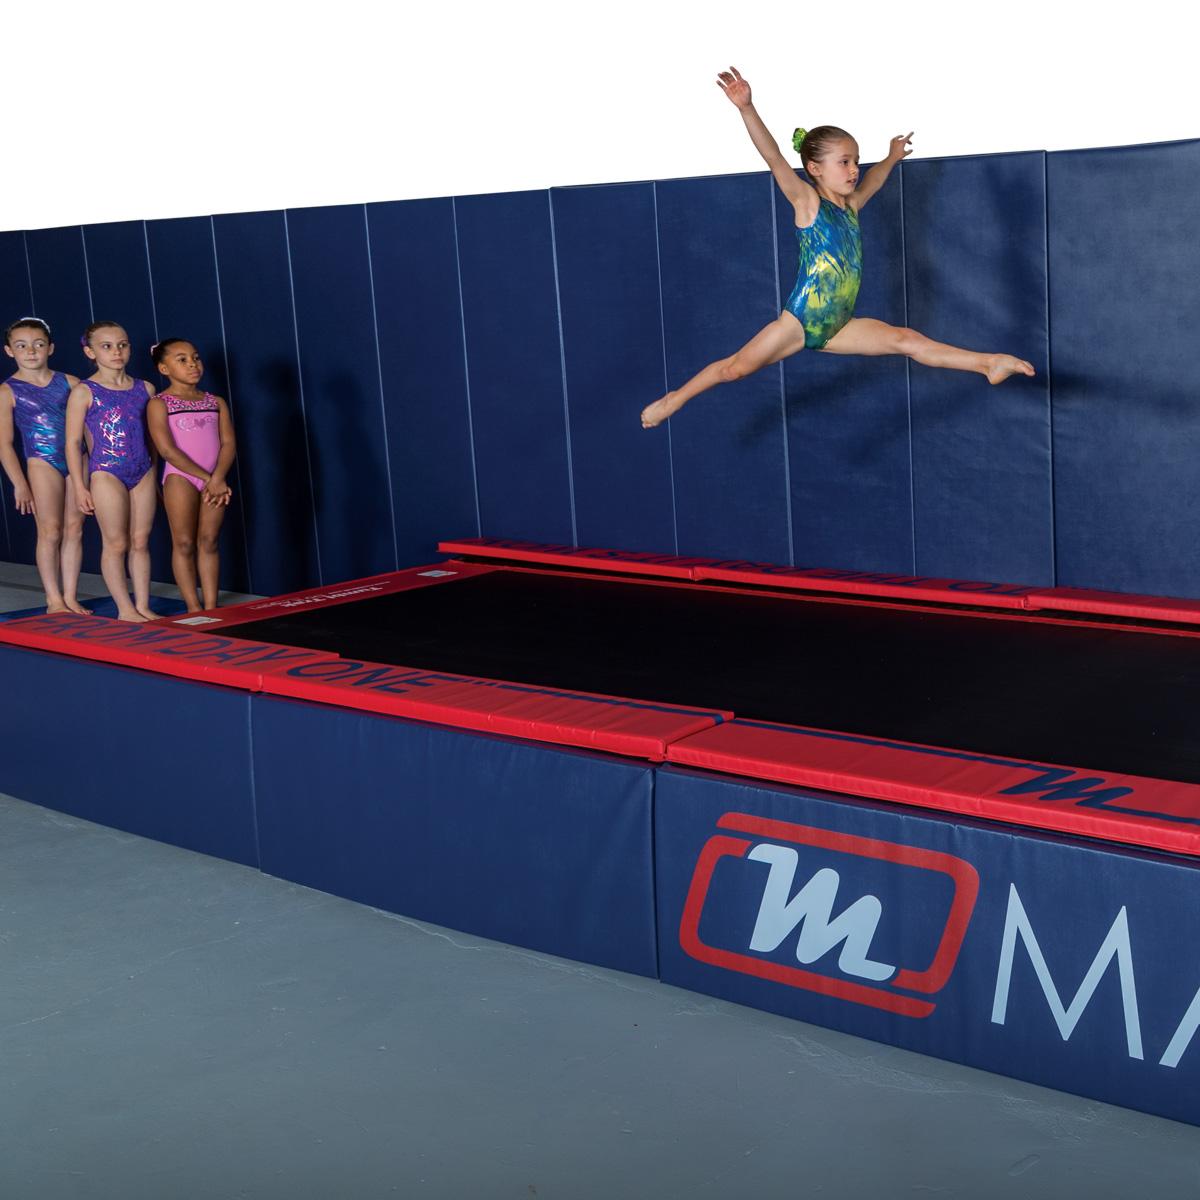 tumbl trak side skirt padded panels with gymnasts top pads and removable wall padding mats - mancino mats